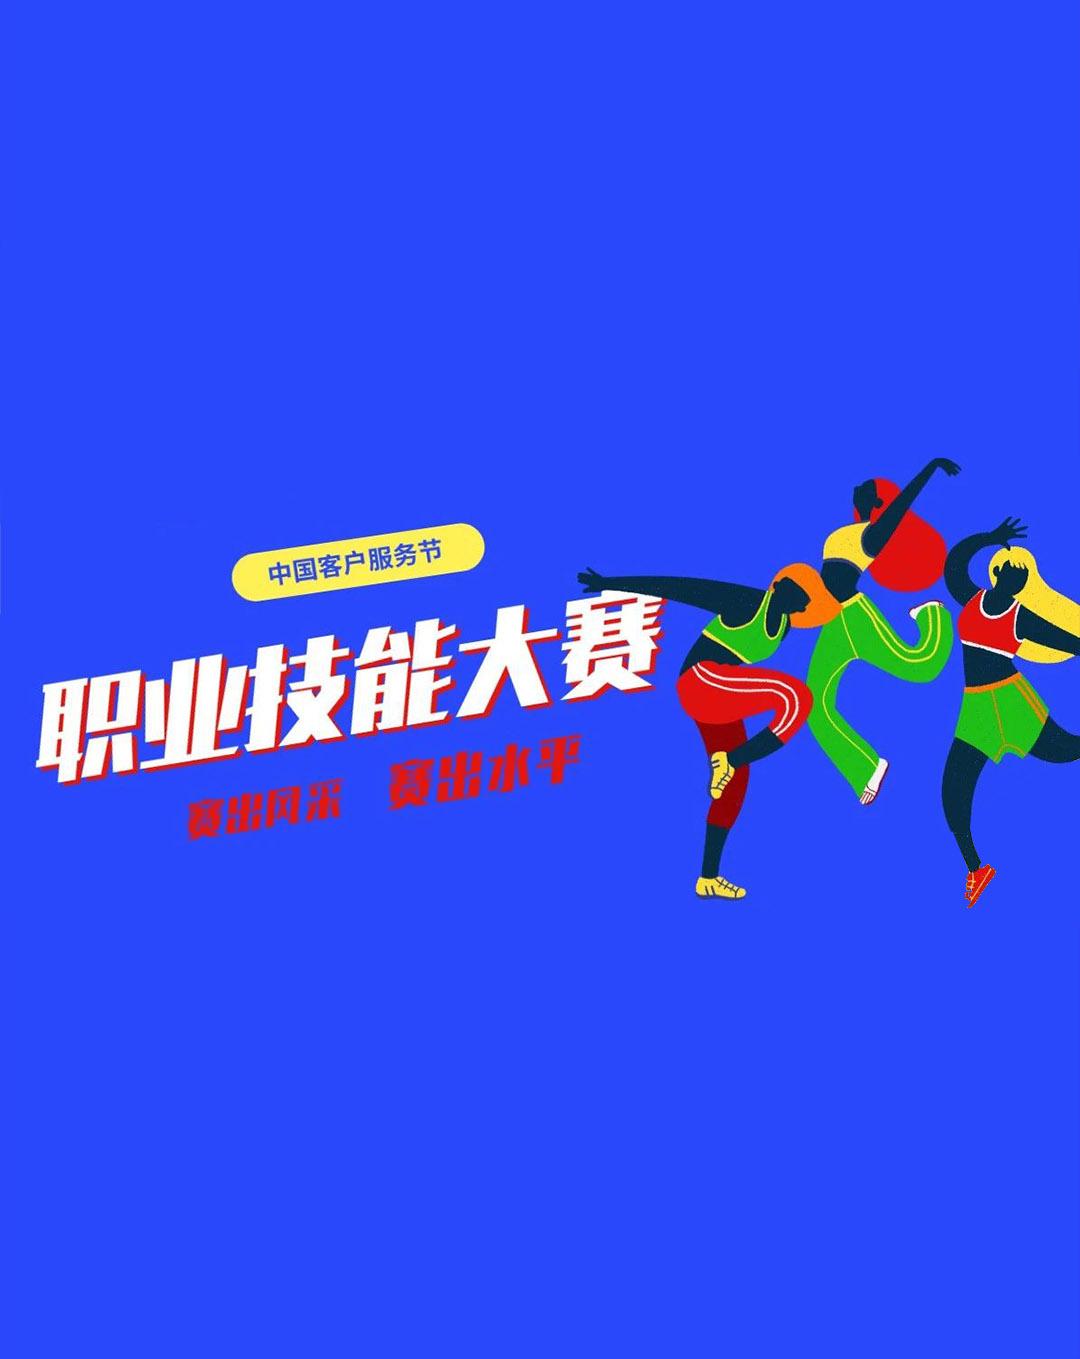 <b>期待 第一届中国客户服务节职业技能大赛来了</b>